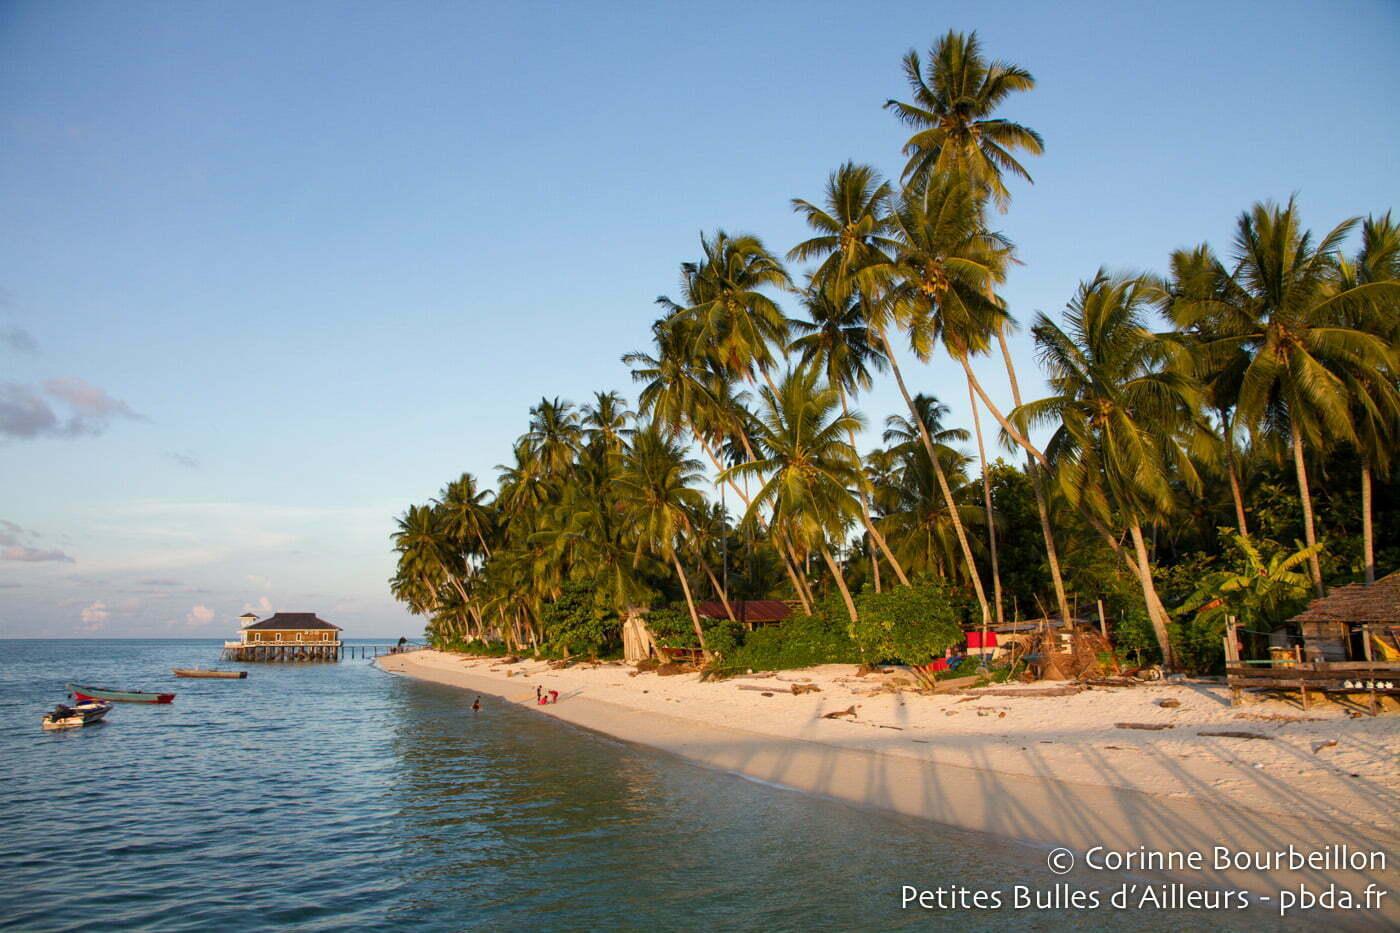 Derawan Island. Bornéo, Indonésie. Juillet 2013.